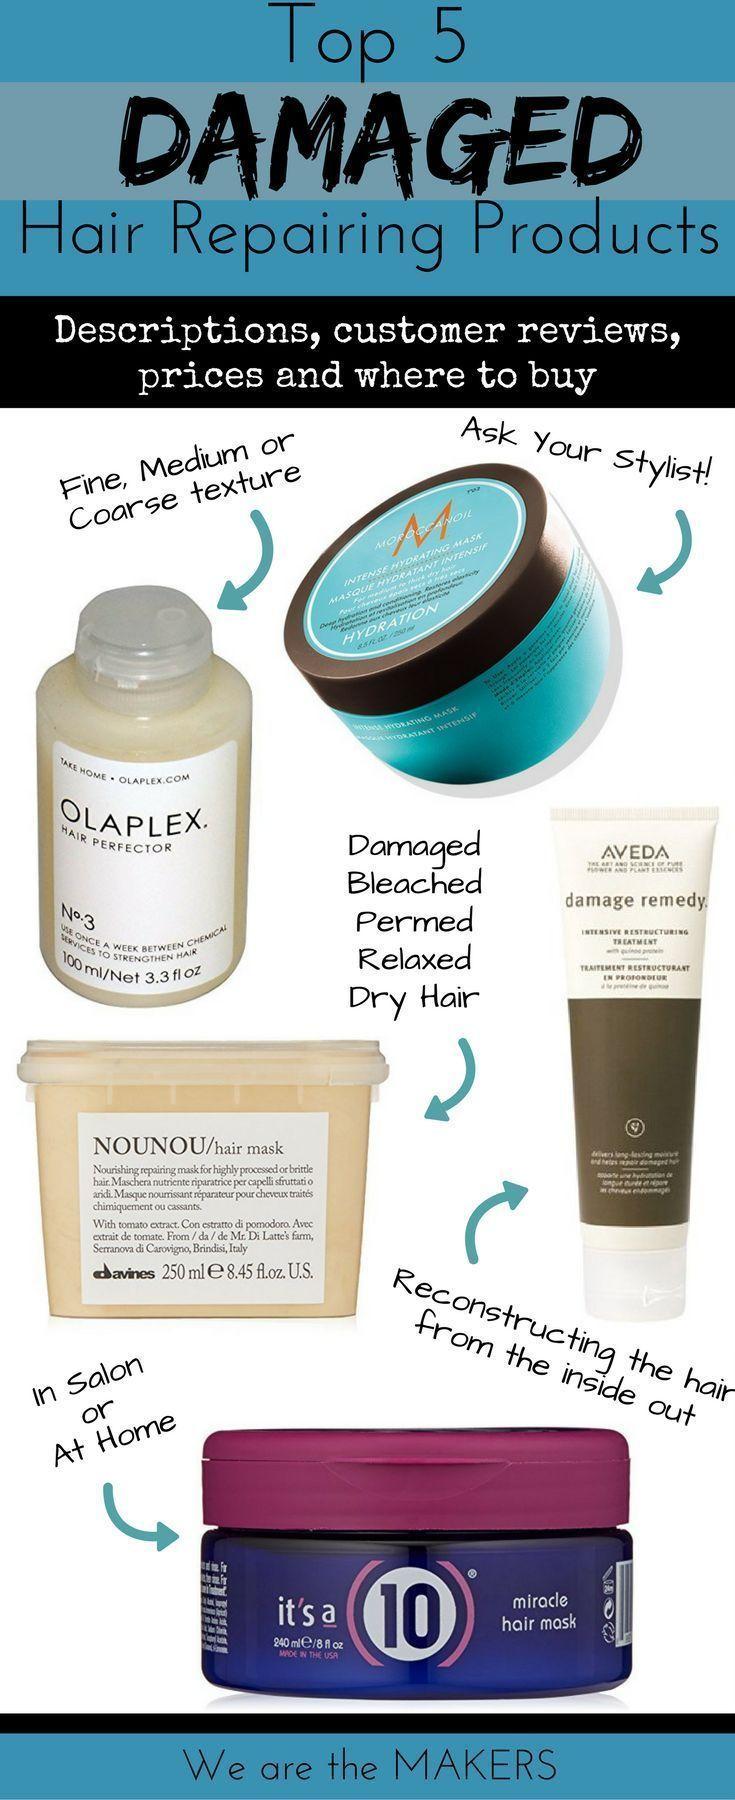 Top 5 Products For Damaged Hair Repair Damaged Hair Repair